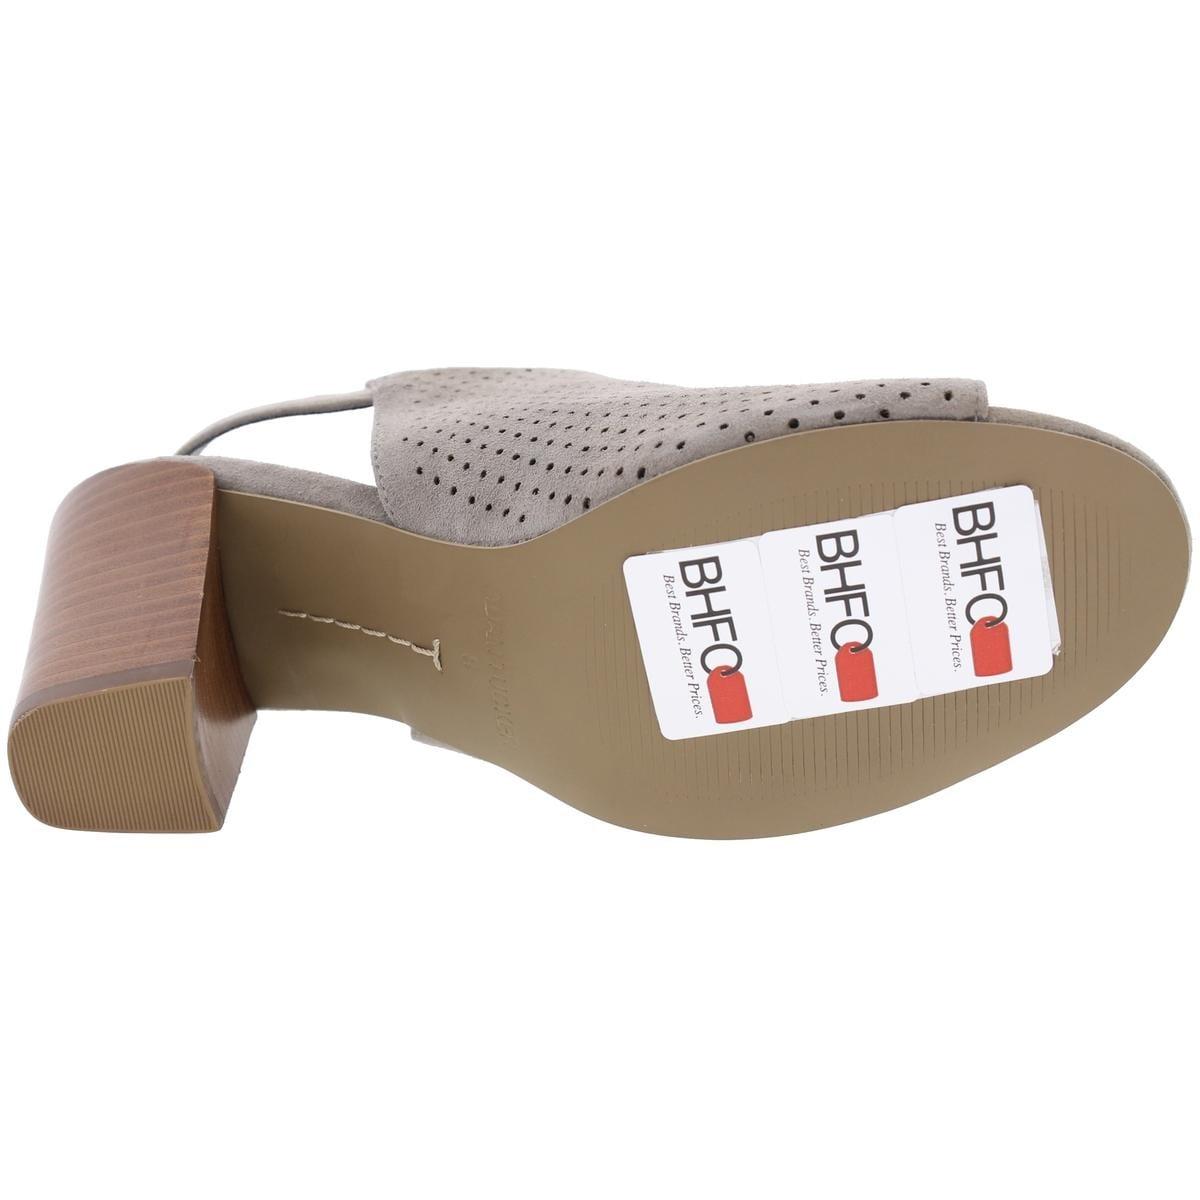 36f0baa6277 Shop Adam Tucker Me Too Womens Meridia Slingback Sandals Mule Stacked Heel  - Free Shipping On Orders Over  45 - Overstock - 21835973